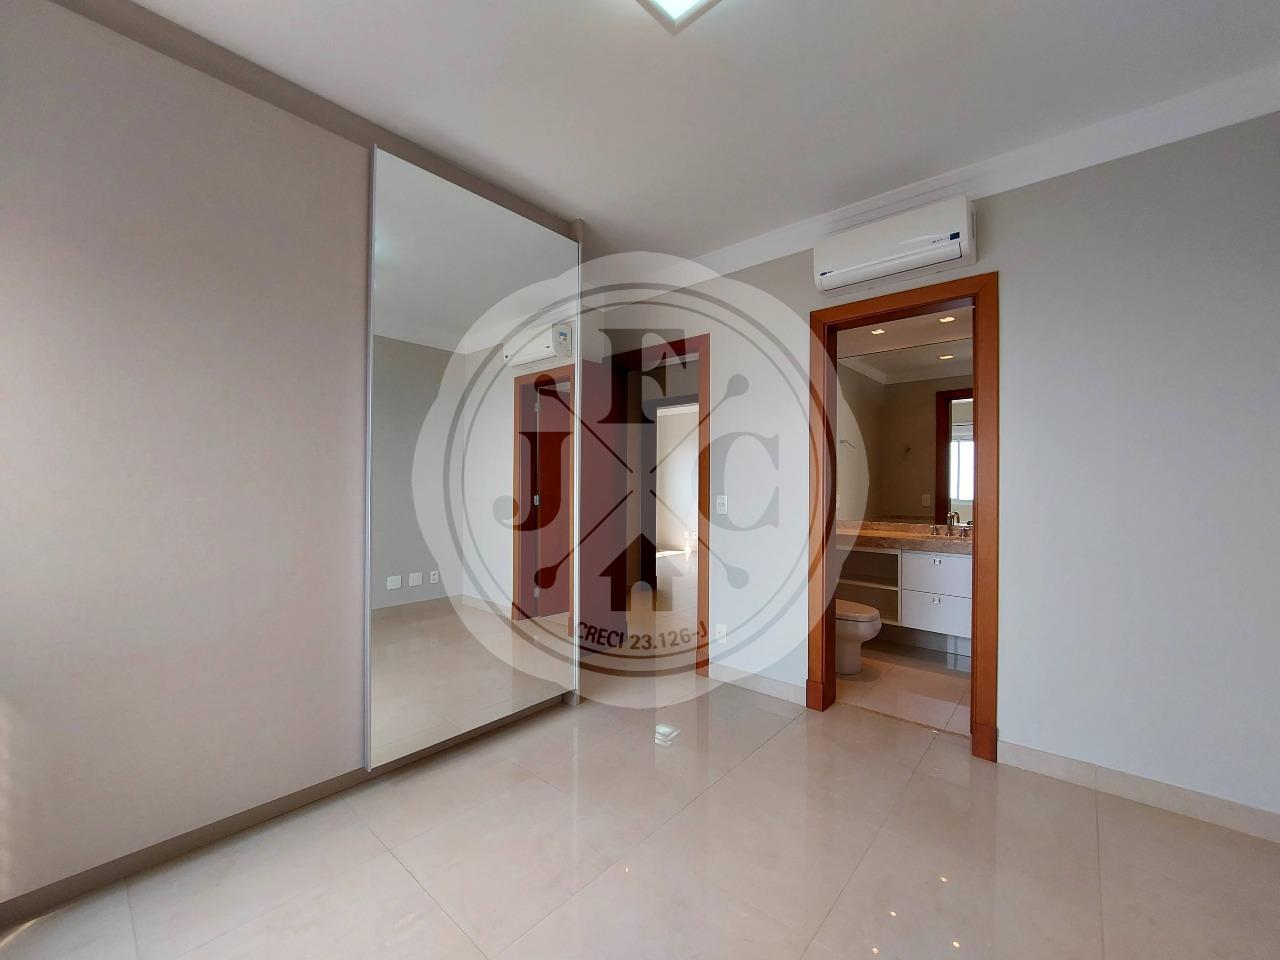 Apartamento para aluguel no Residencial Morro do Ipê: Suíte 4